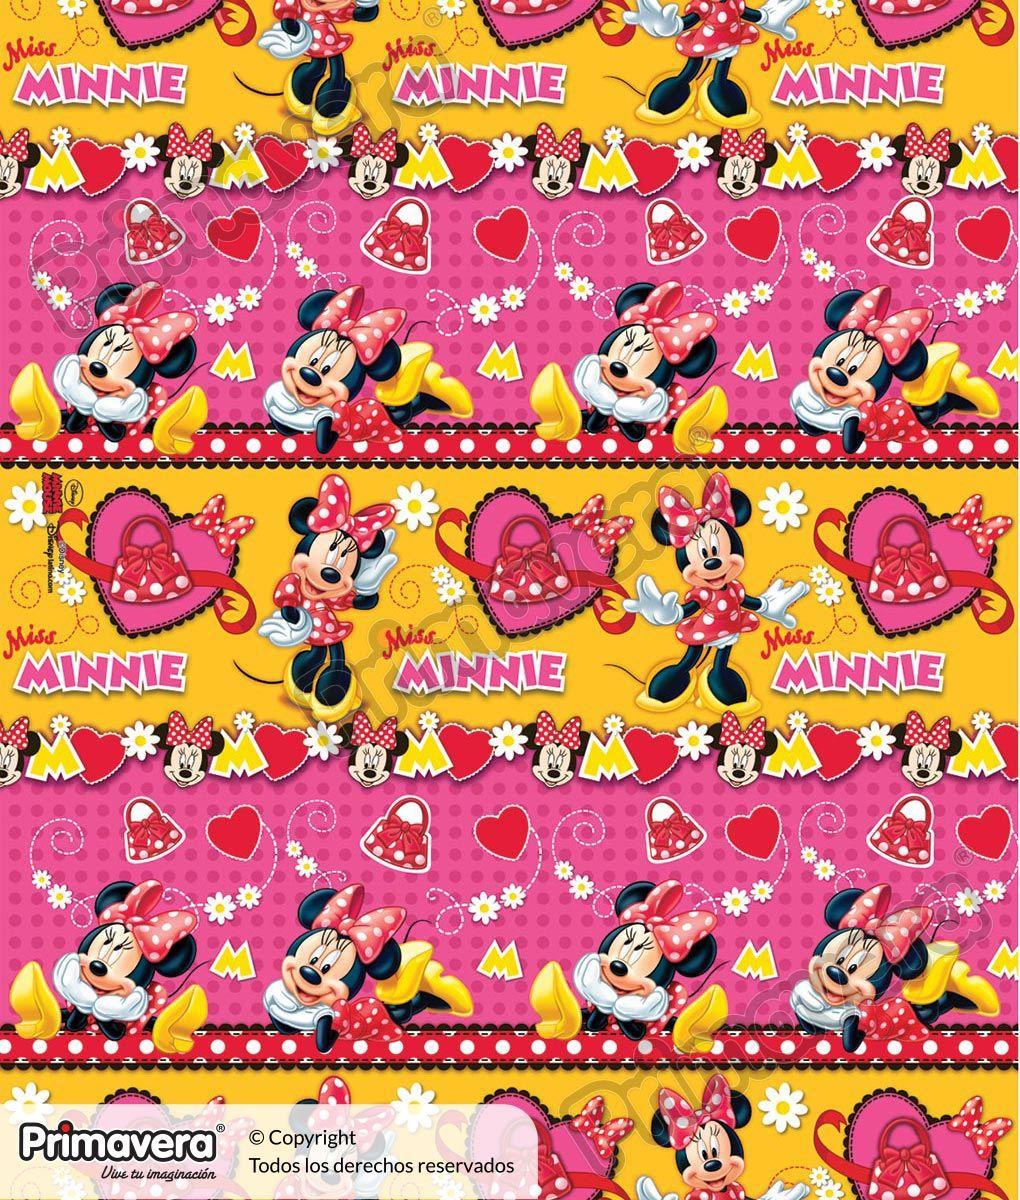 Papel Regalo Minnie Mouse 1-18-734 http://envoltura.papelesprimavera.com/product/papel-regalo-minnie-1-18-734/